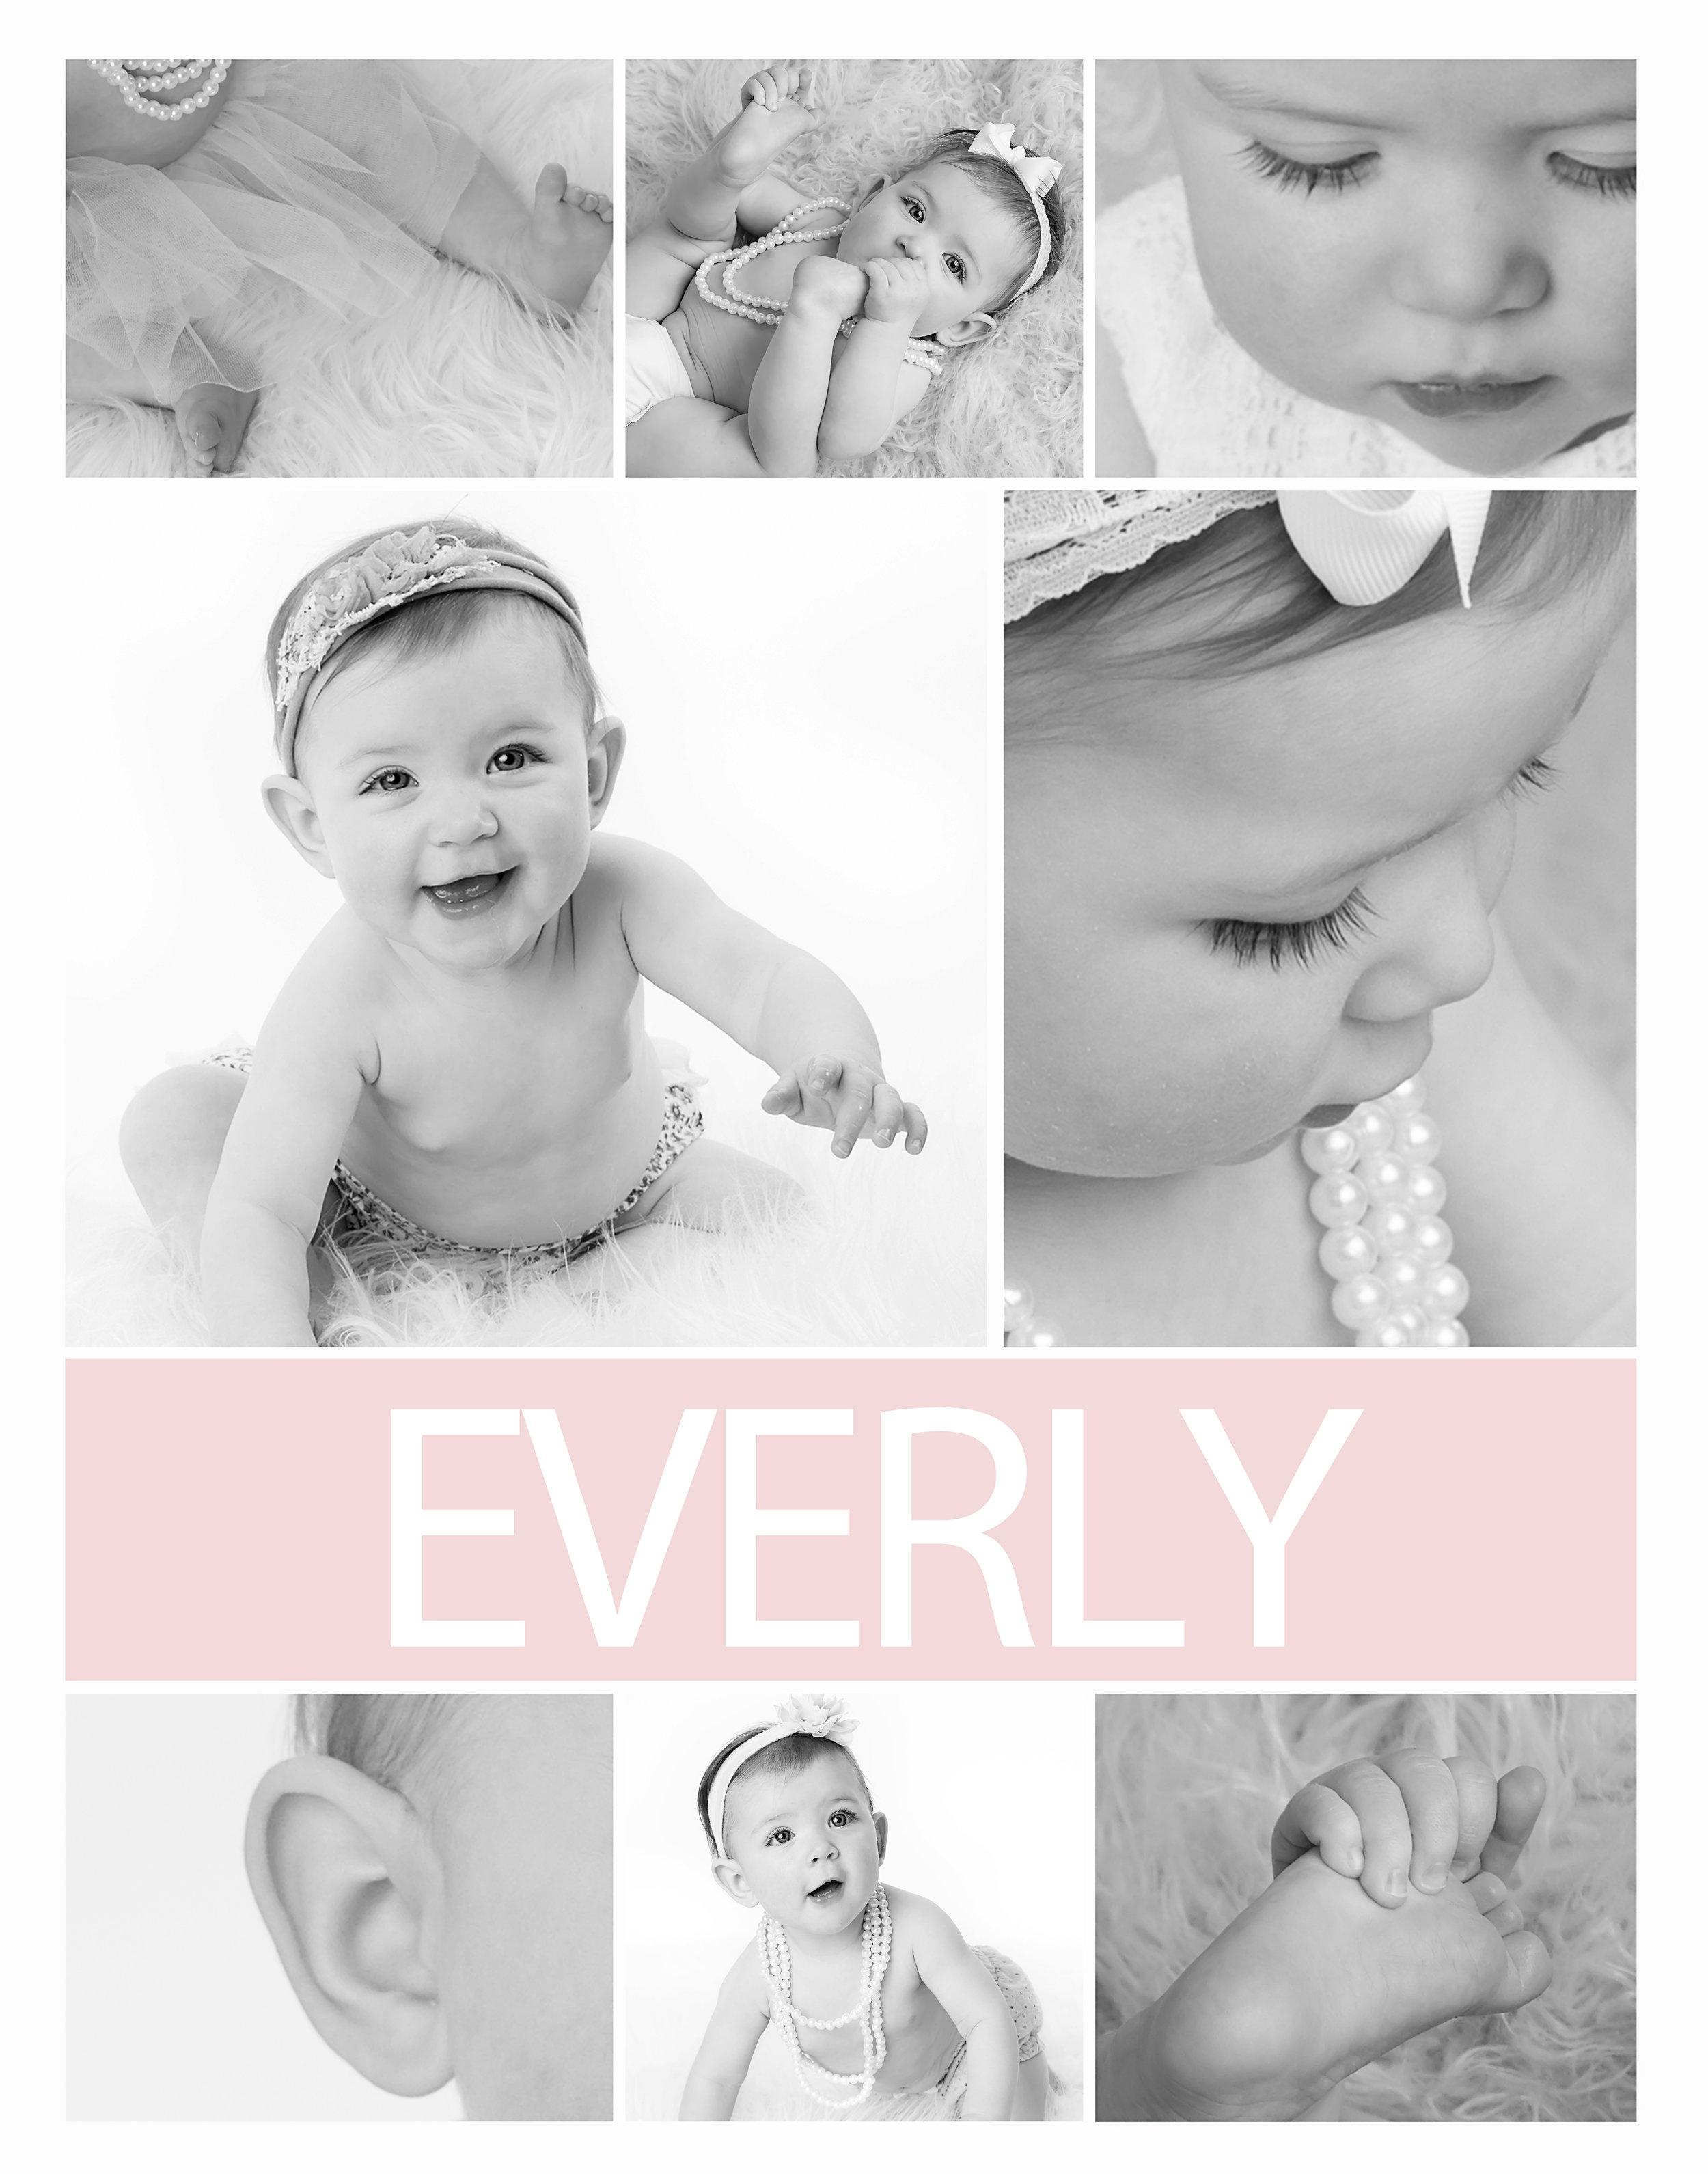 Everly Collage- 11x14.jpg